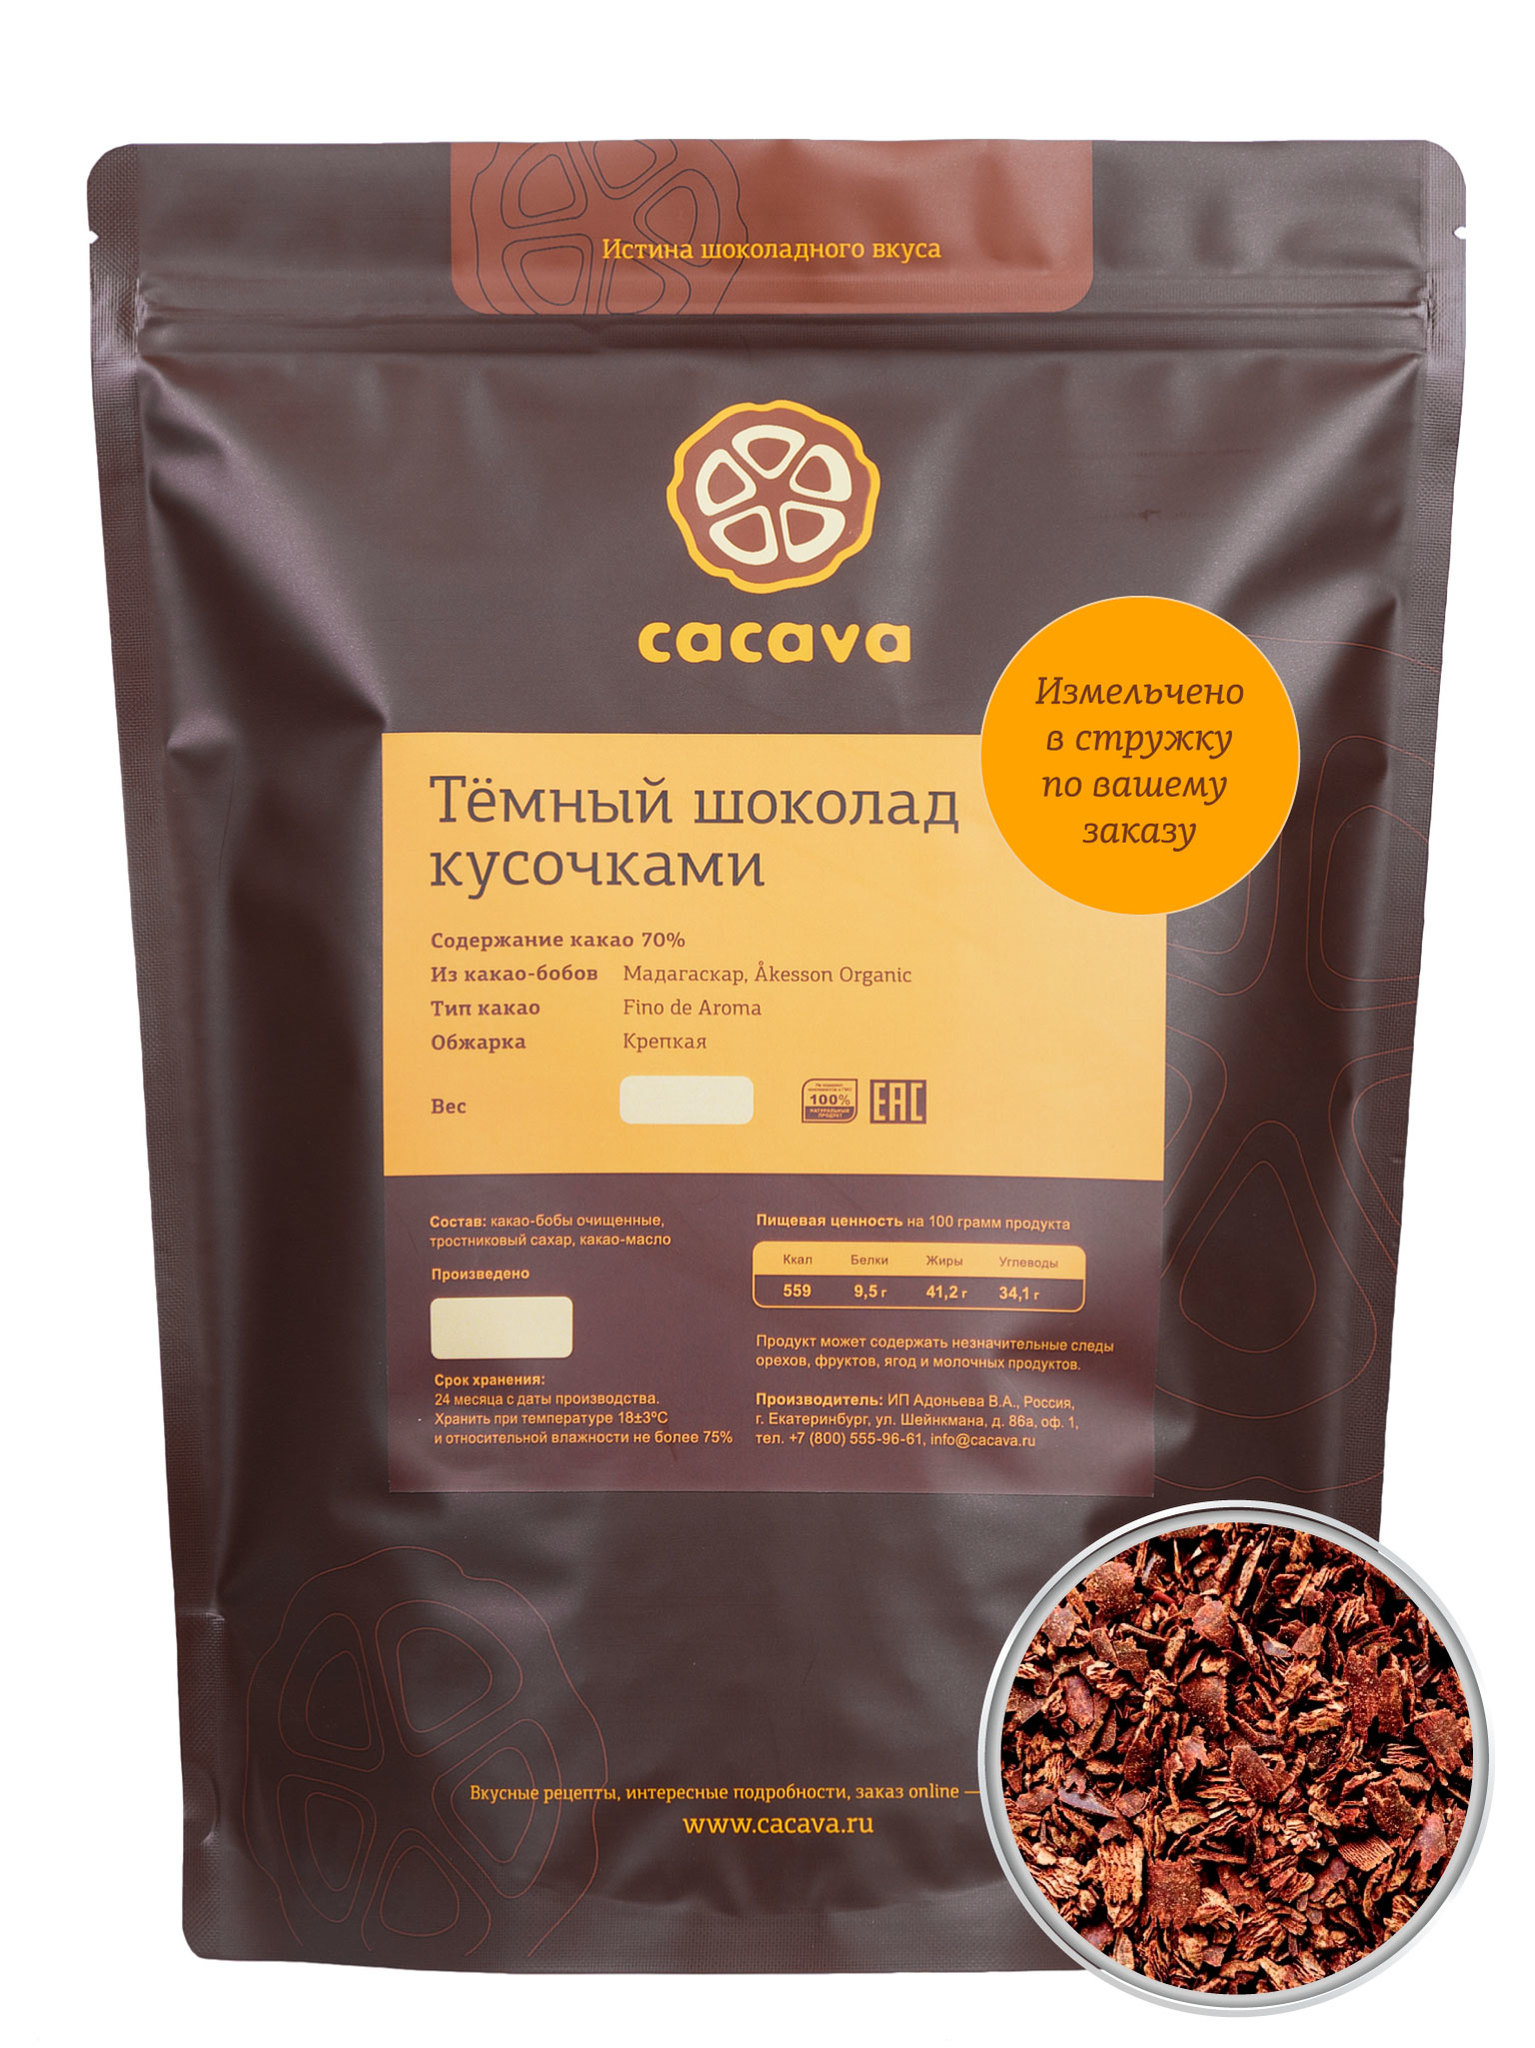 Тёмный шоколад 70 % какао в стружке (Мадагаскар, Åkesson), упаковка 1 кг